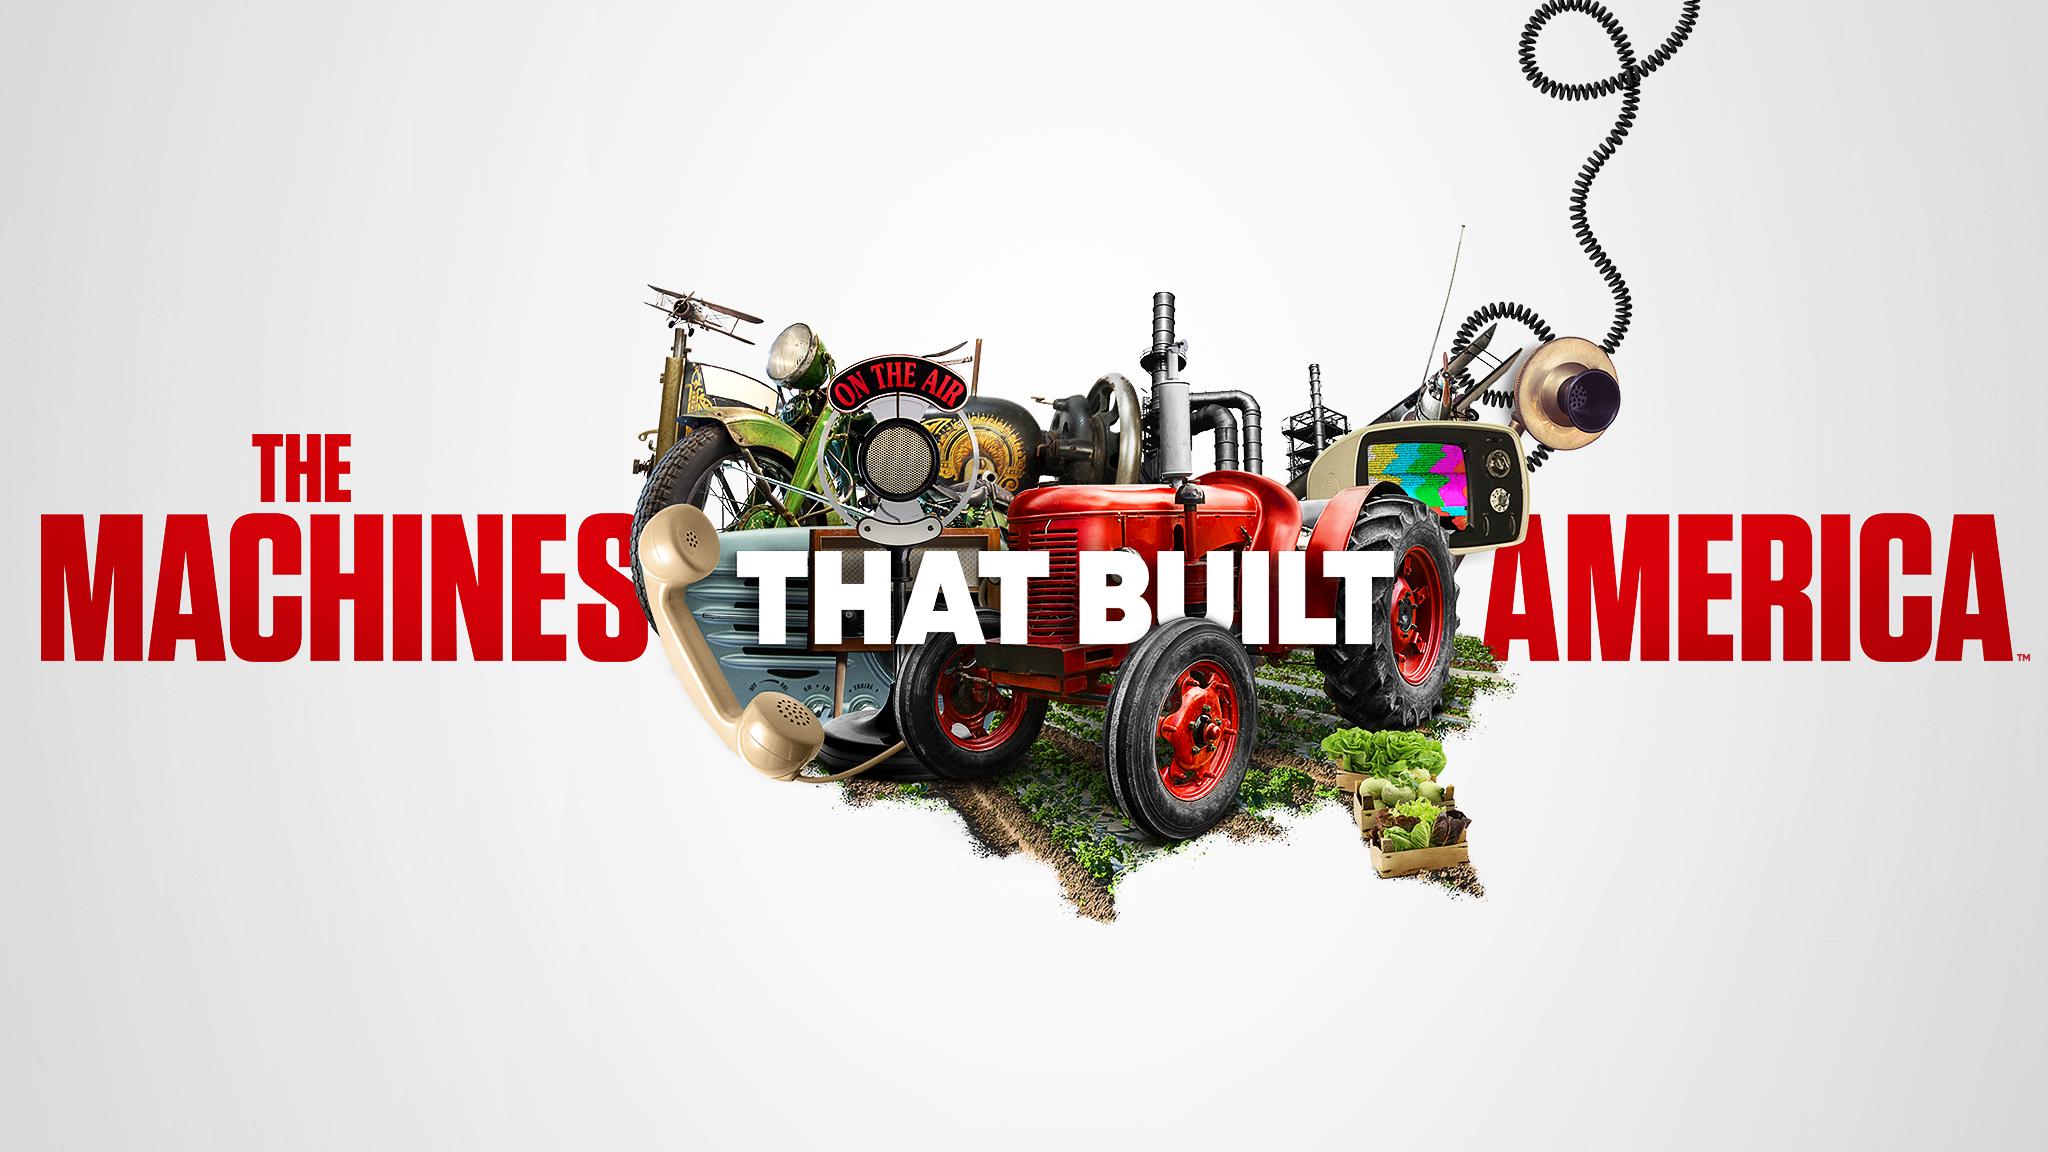 The Machines That Built America Alt Image